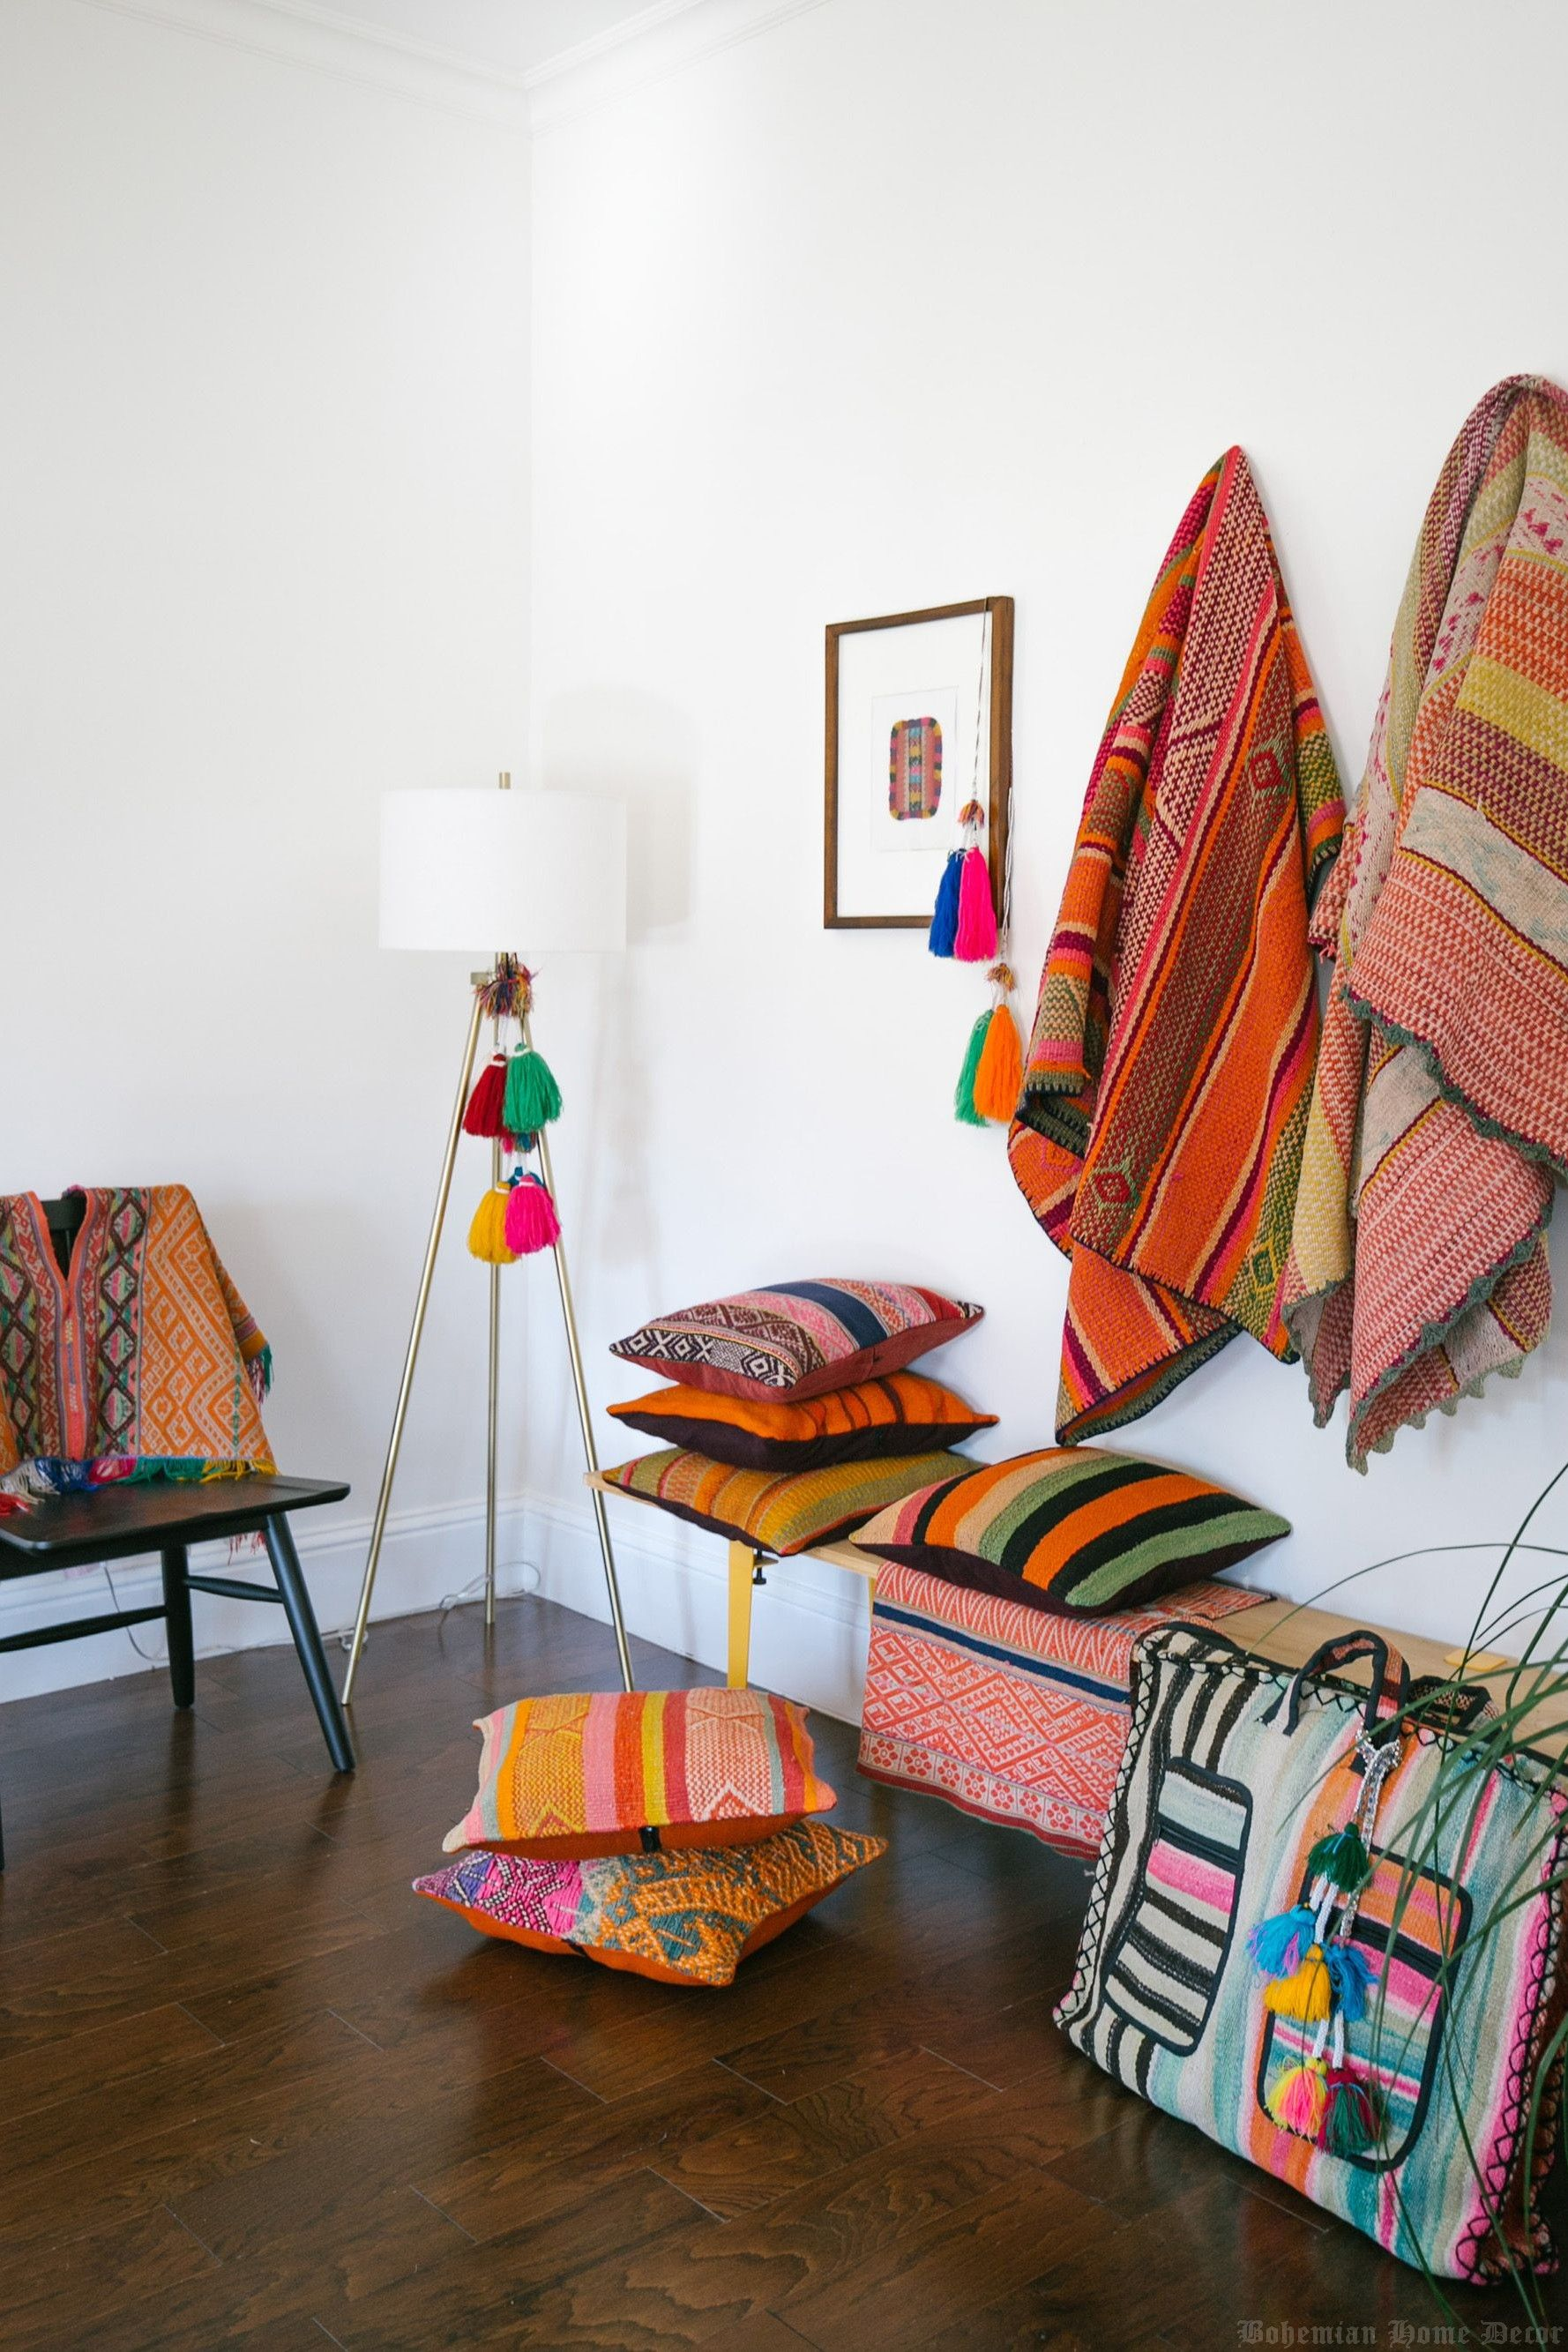 Bohemian Home Decor Explained